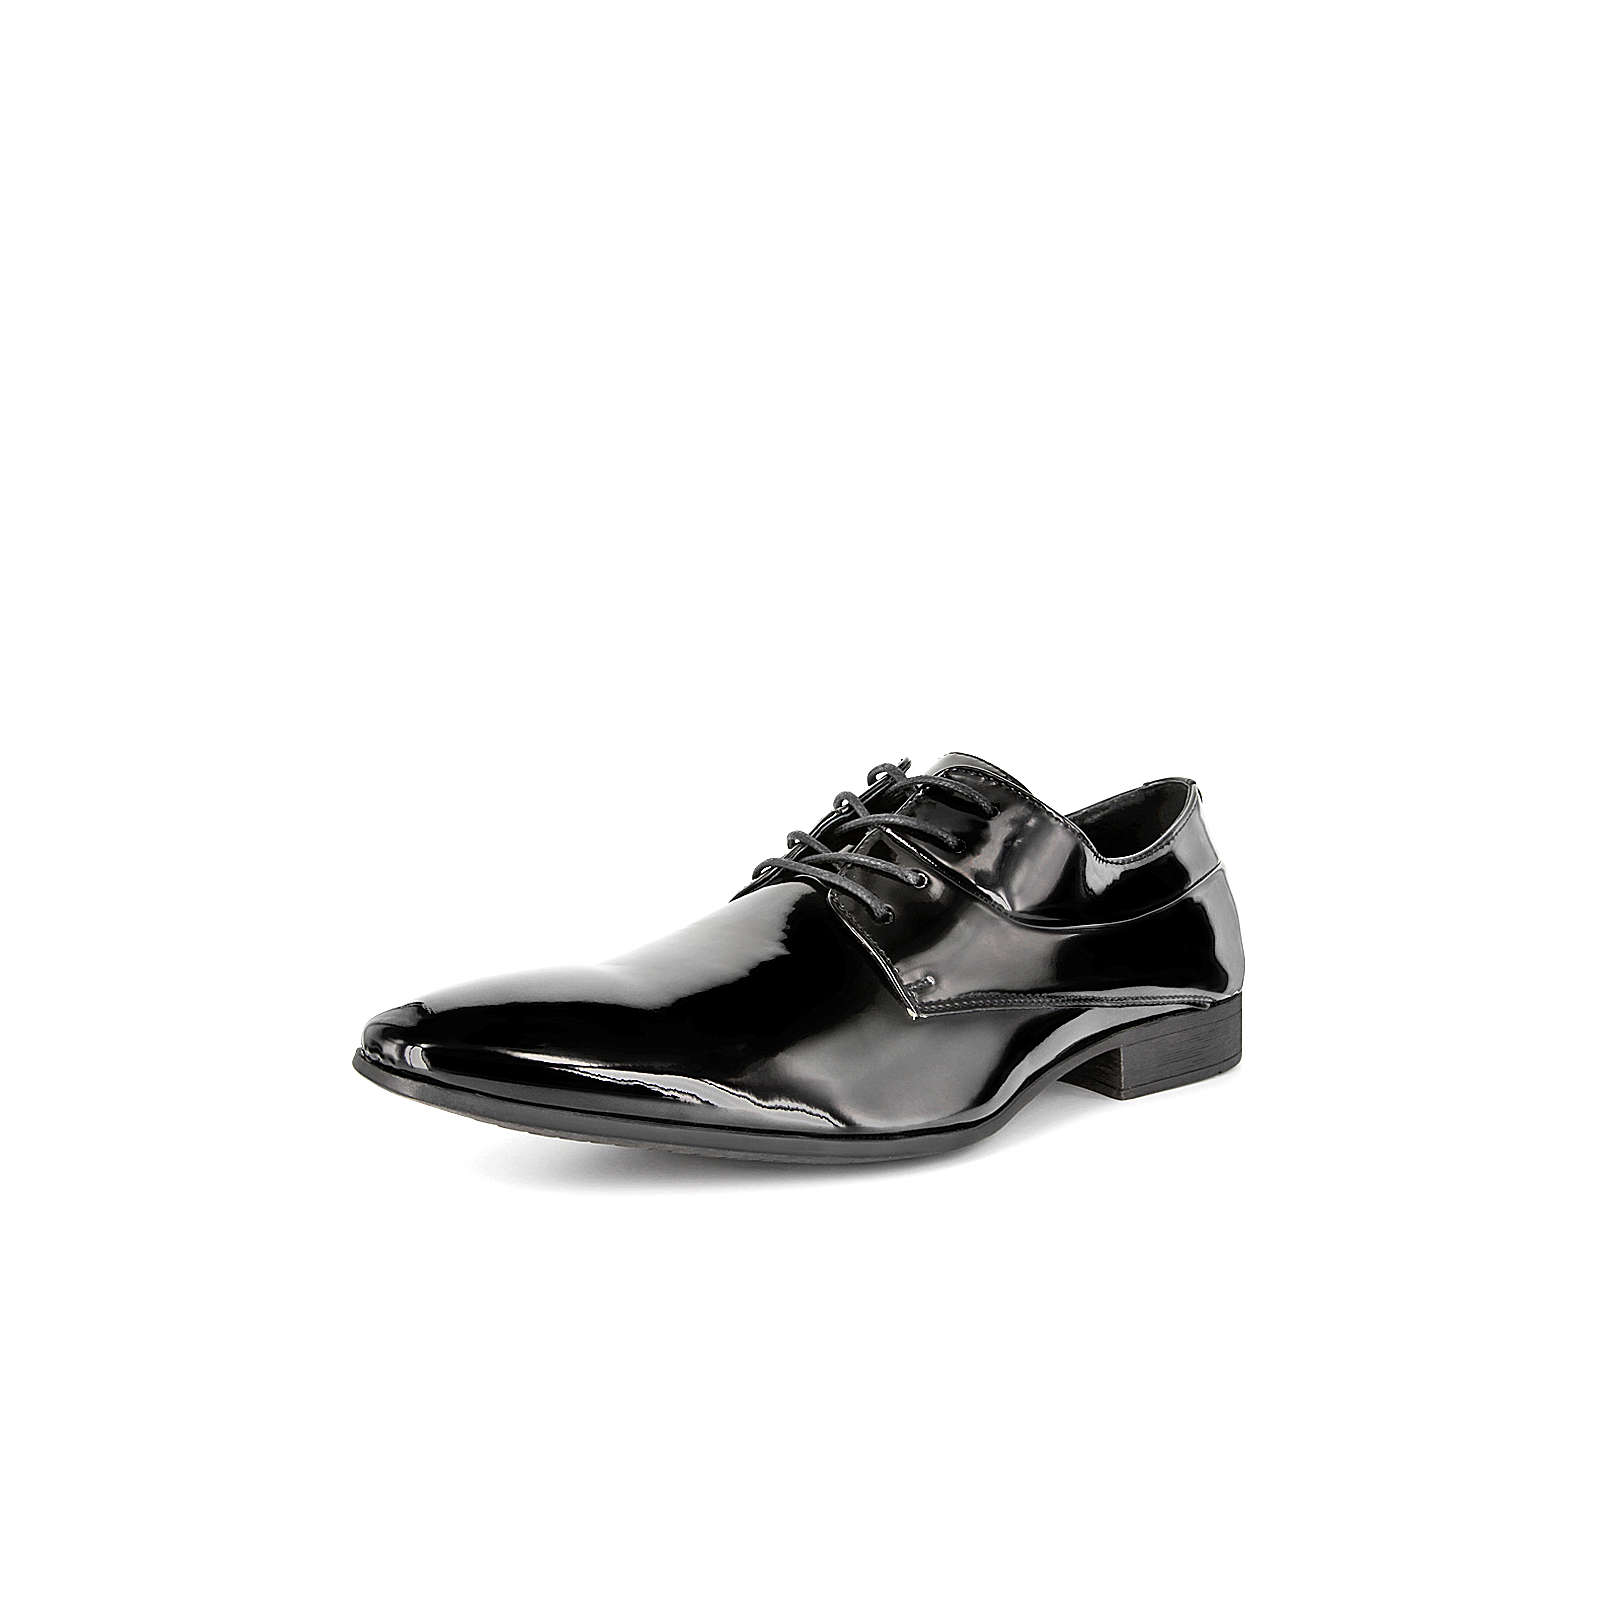 Fitters Footwear Business-Schnürschuhe schwarz Herren Gr. 45